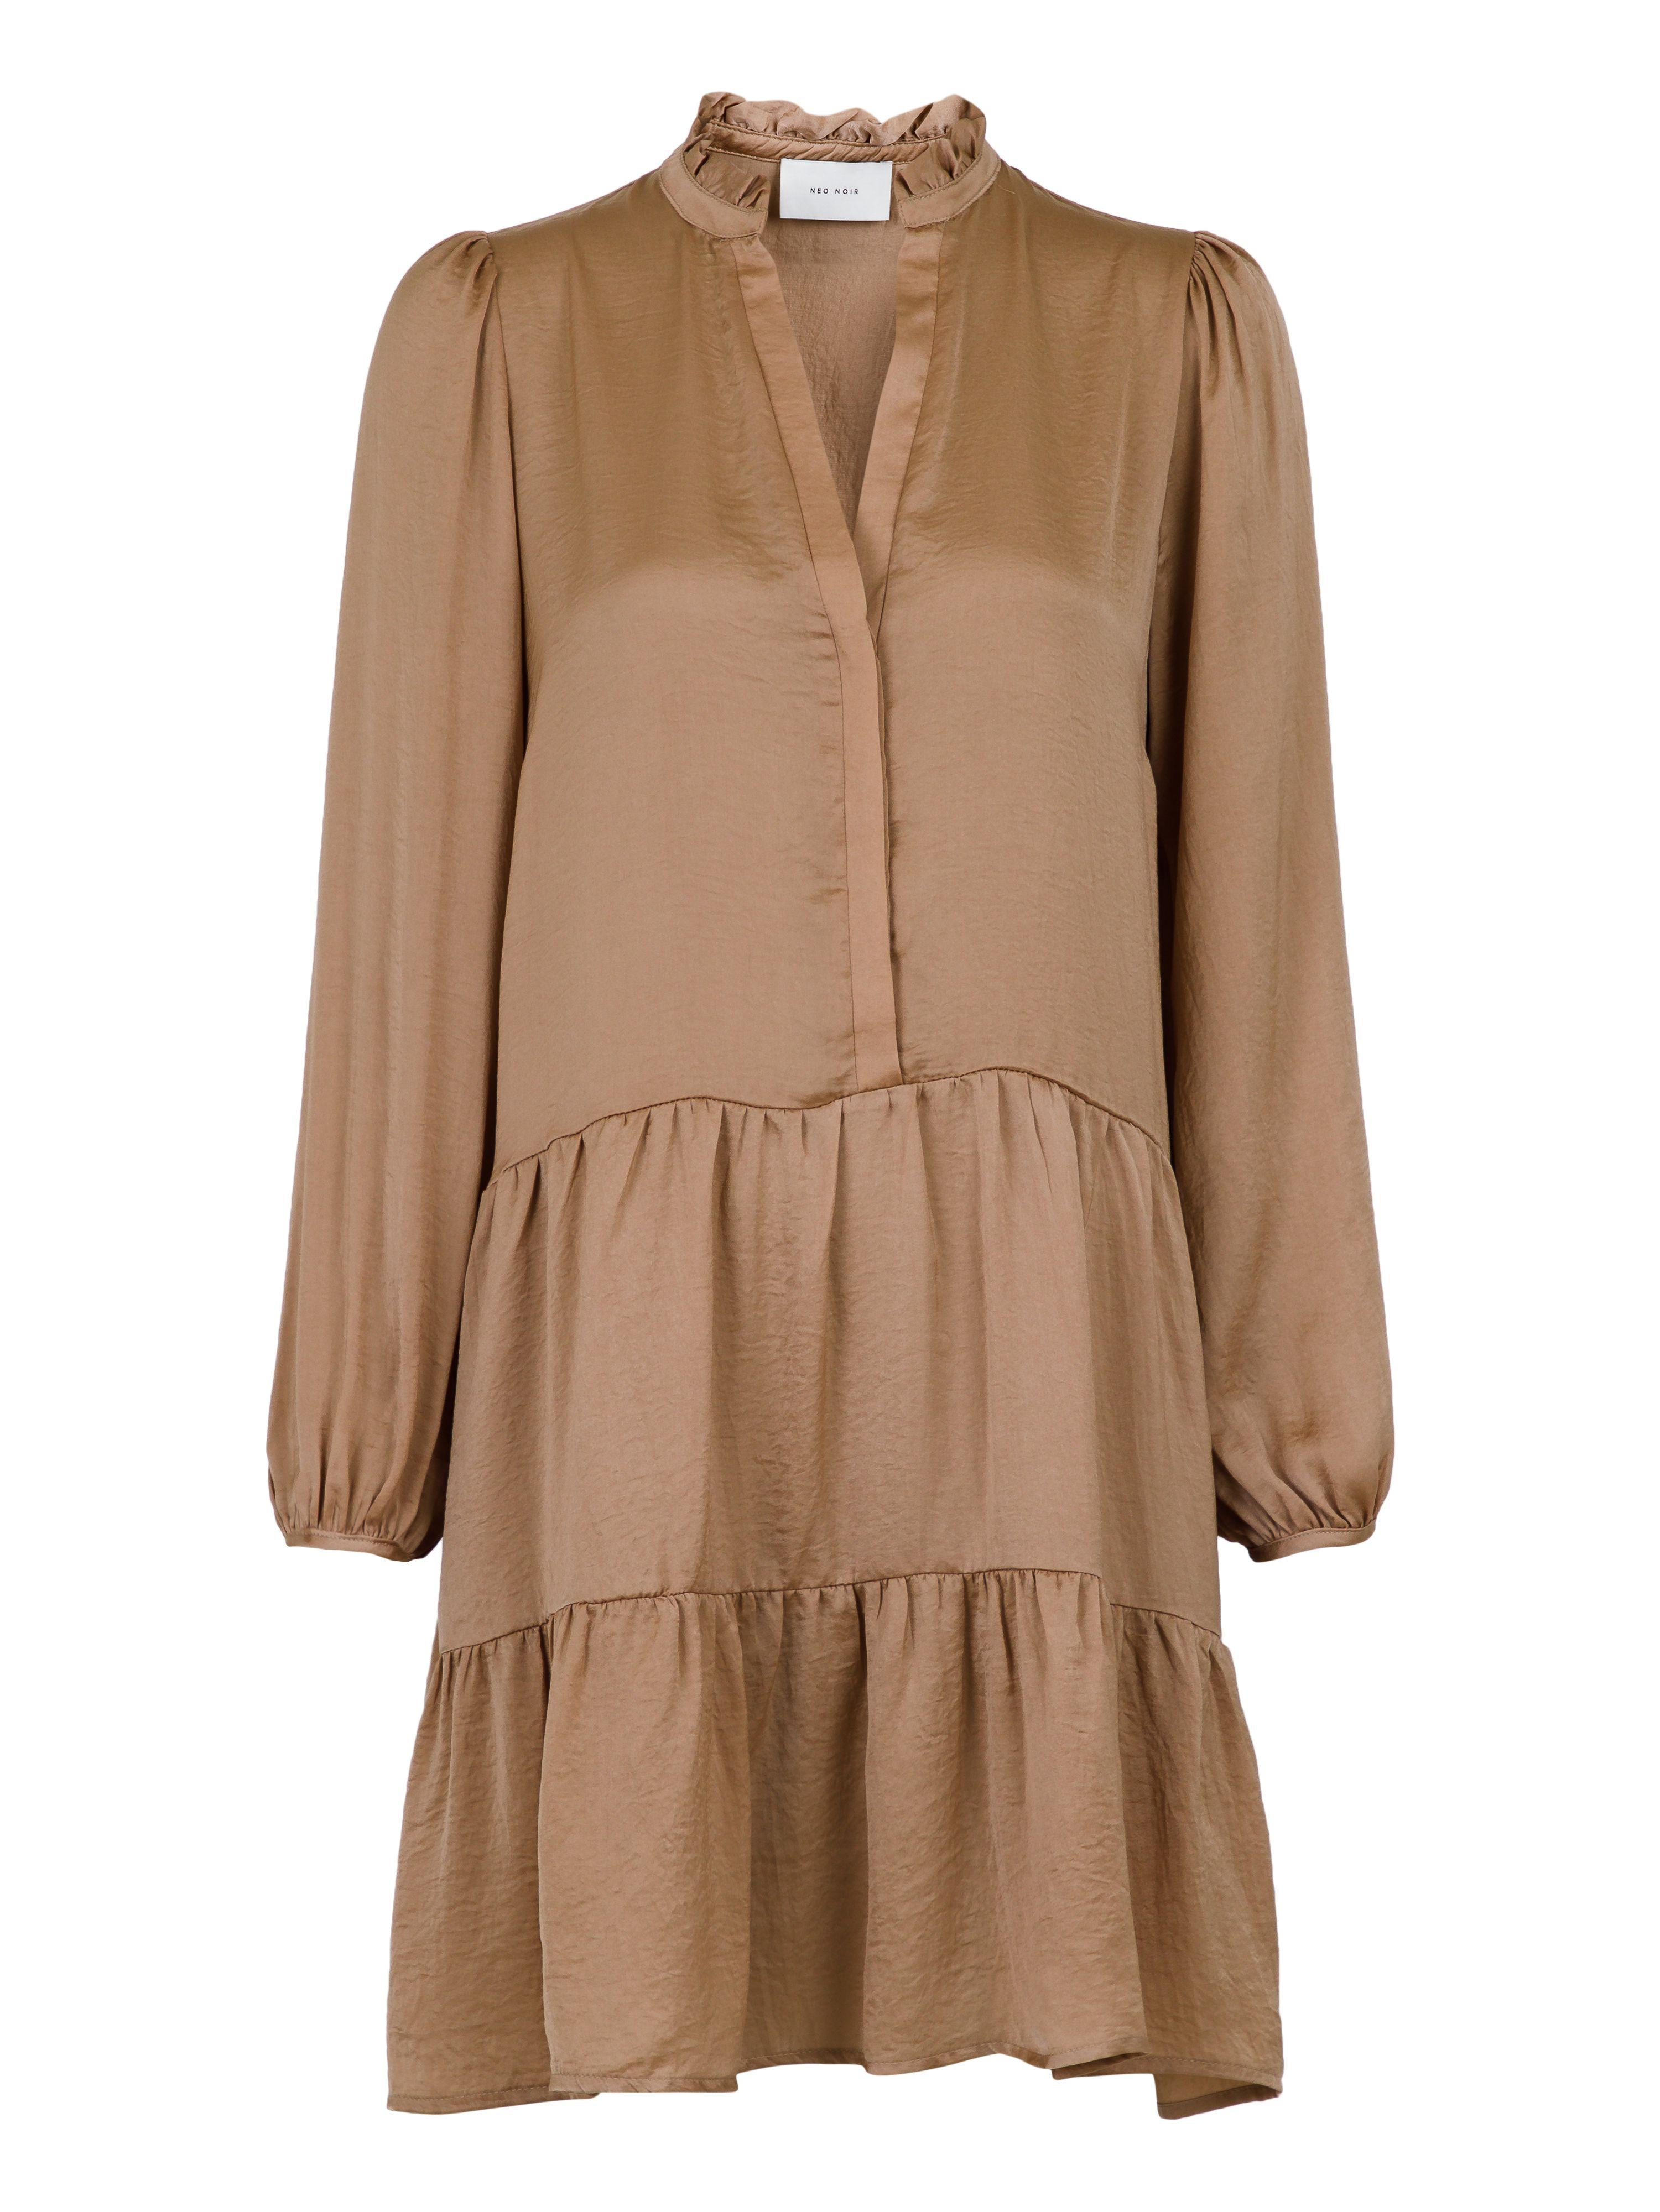 Neo Noir Federica Soft kjole, camel, large